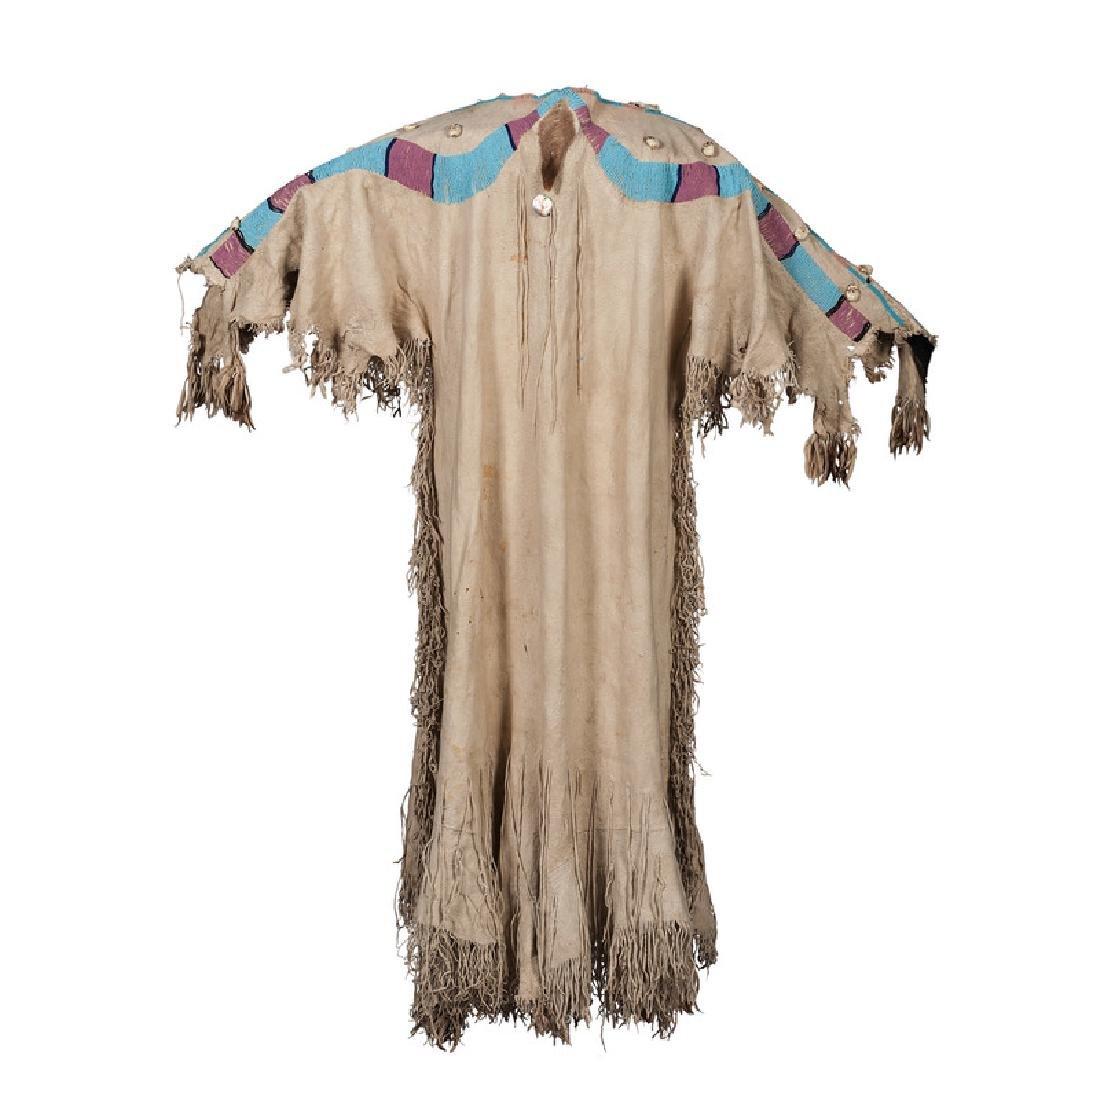 Nez Perce Beaded Hide Dress - 2